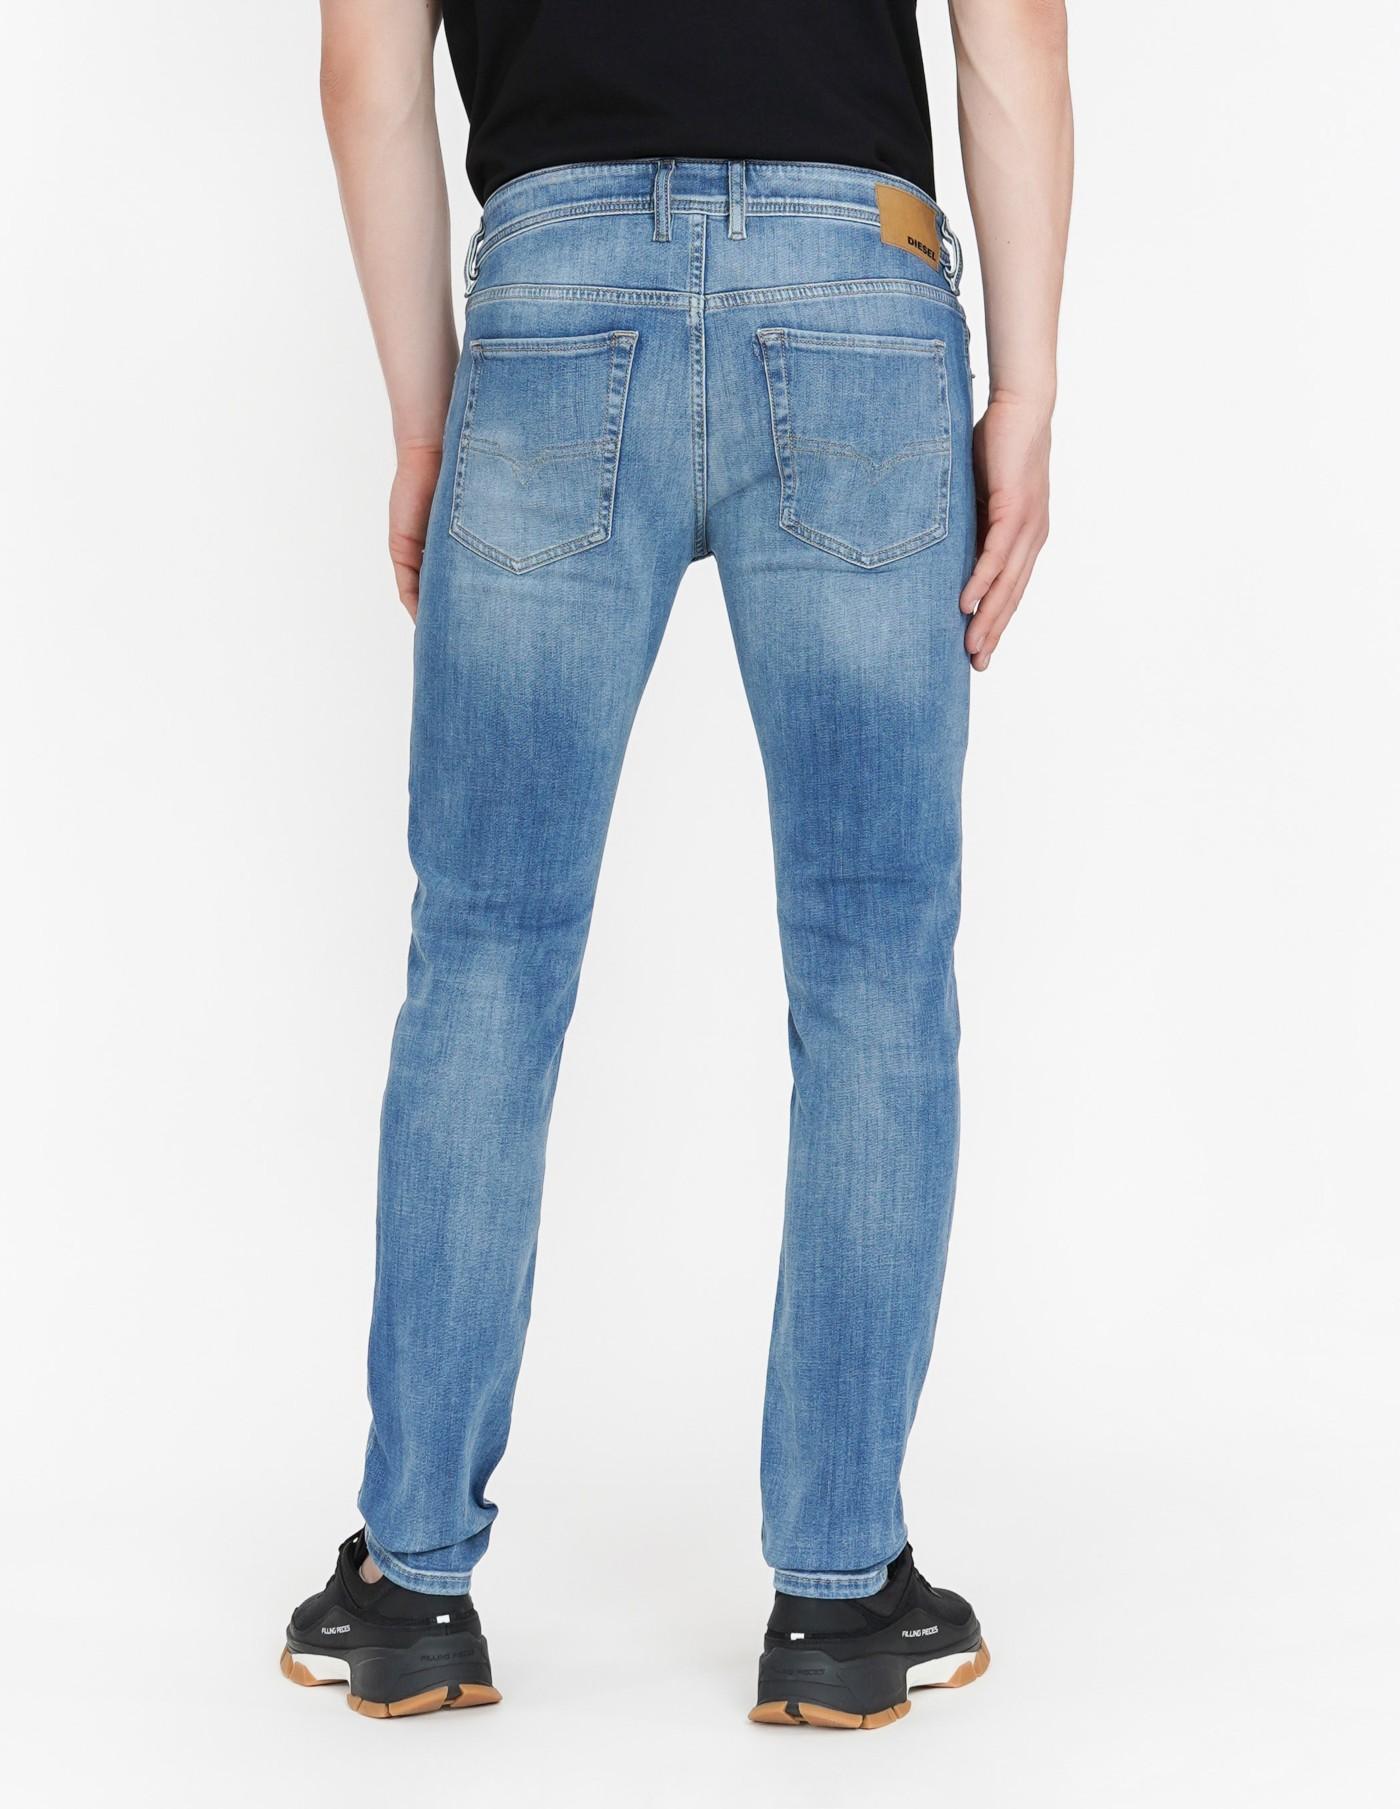 Diesel Pantalon Vaquero Sleenker 00swf 0095g 01 Azul Claro